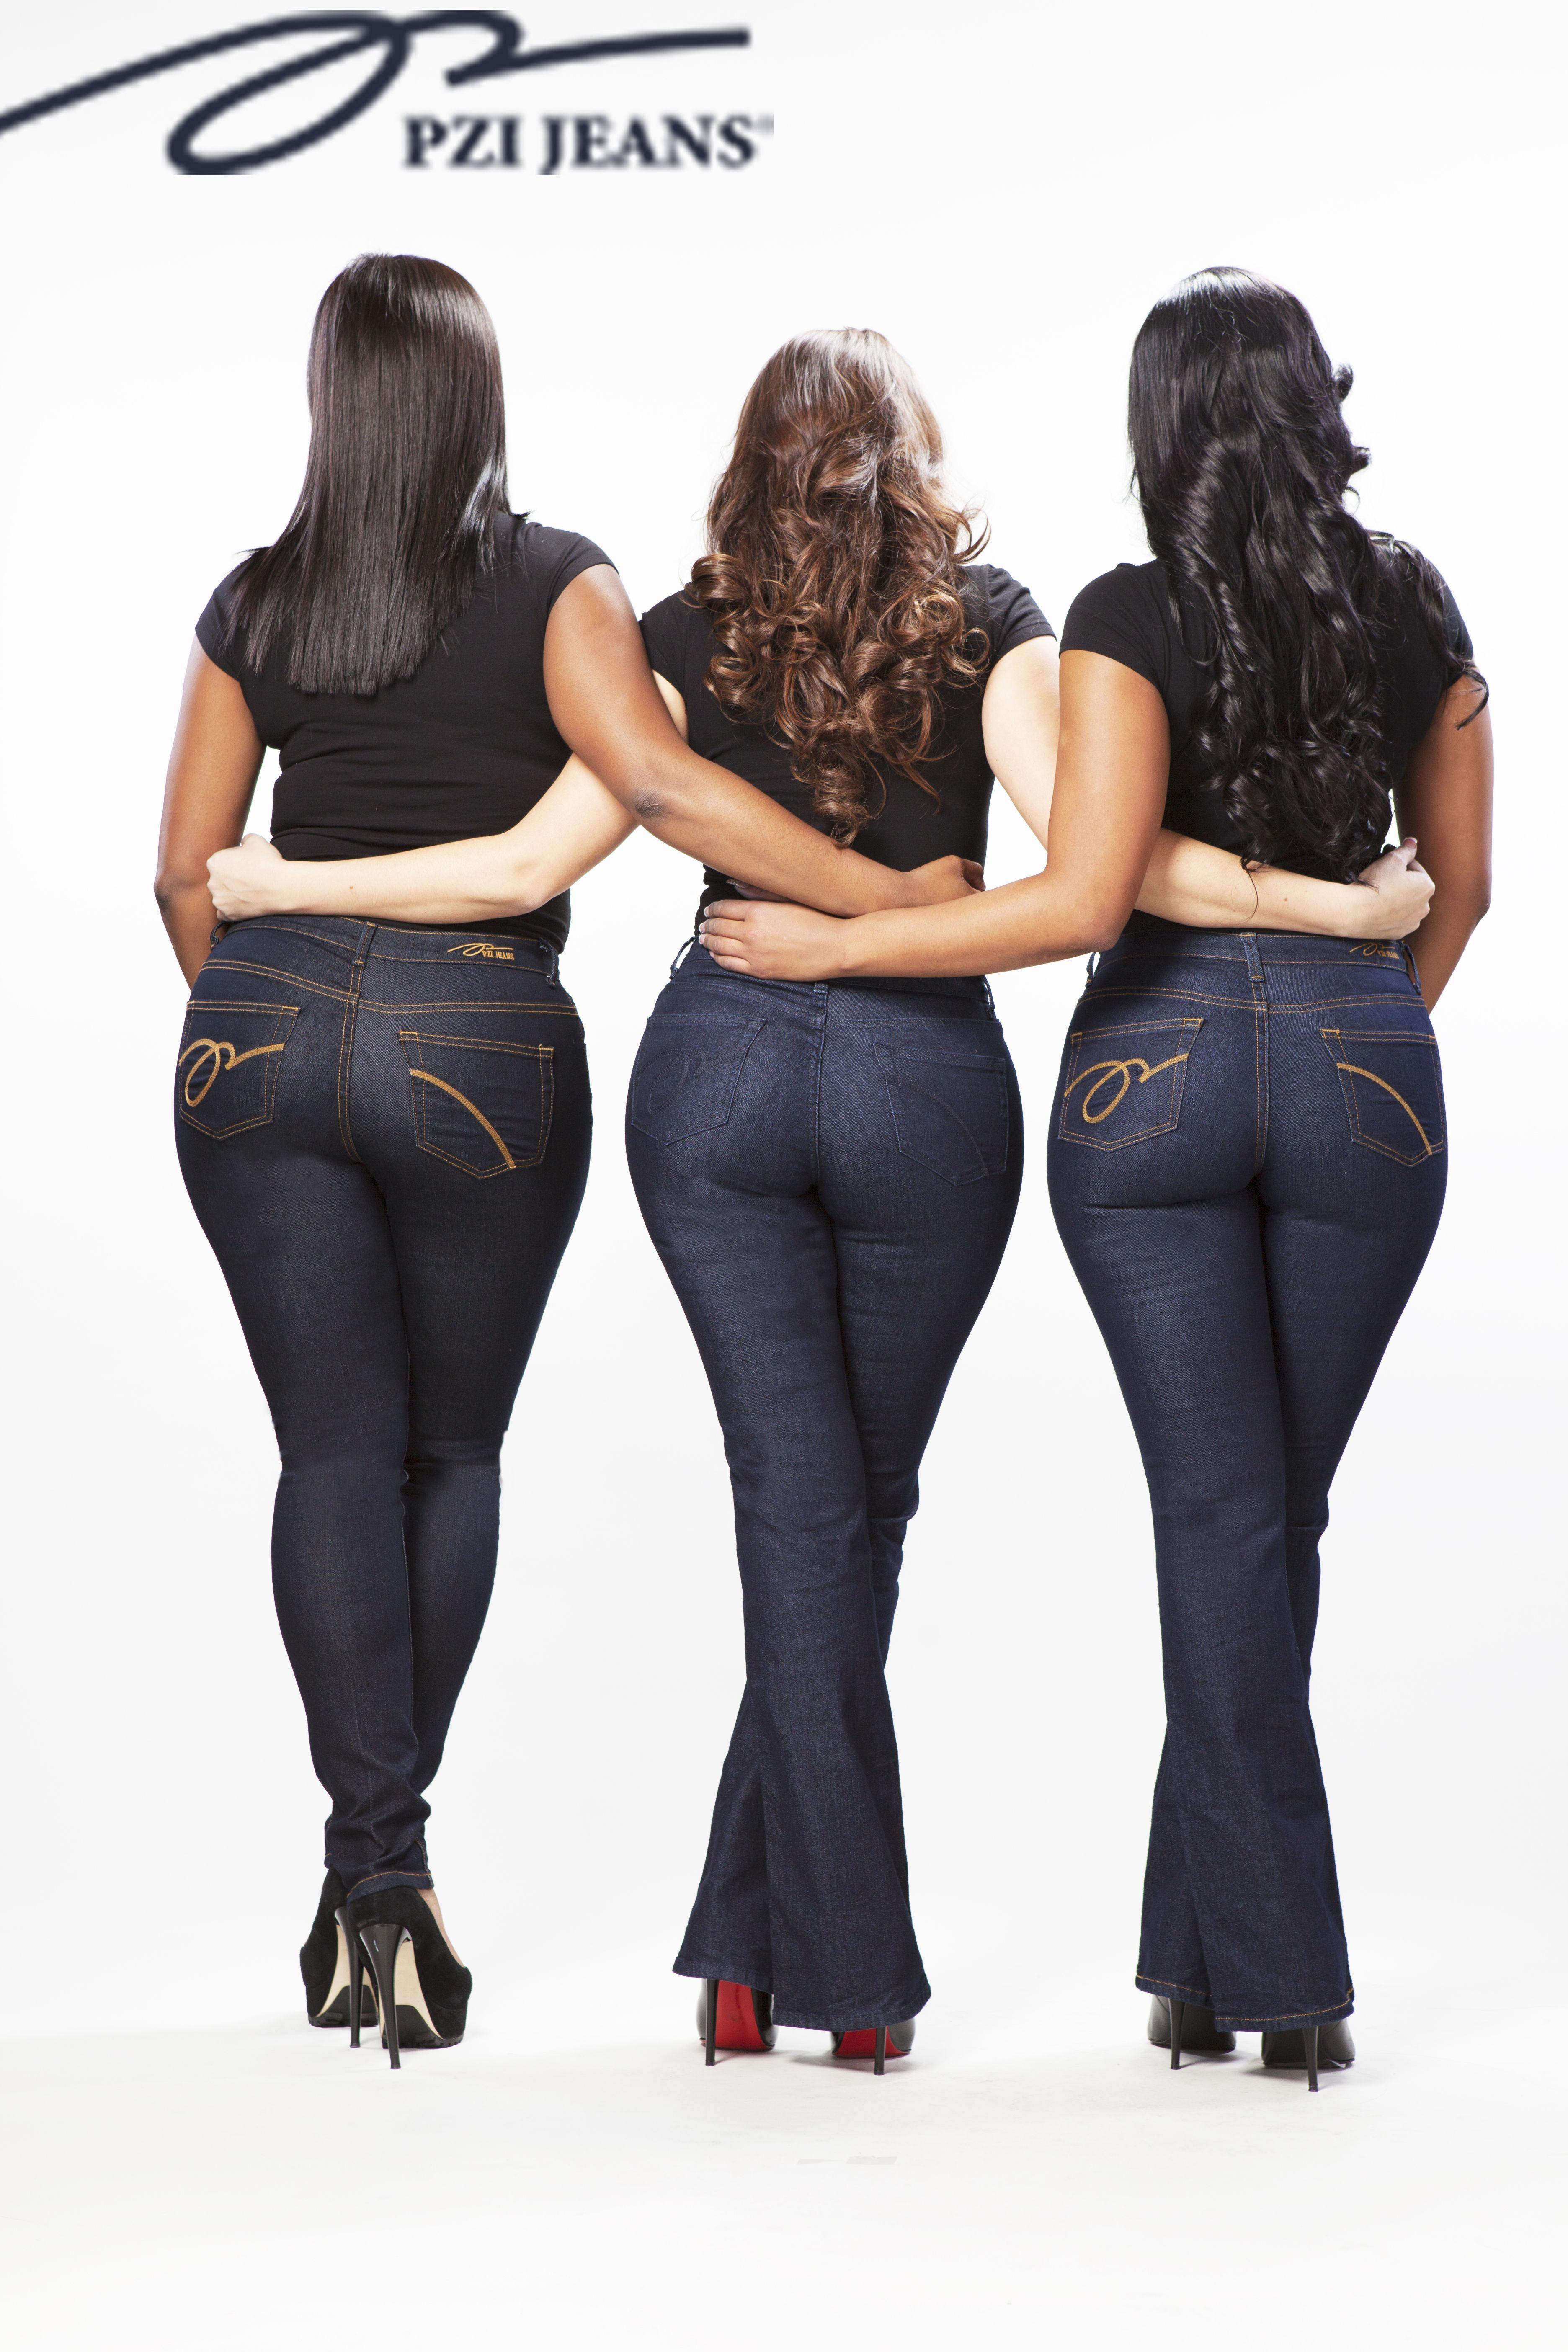 927944b7bf6 Curvy Girls Rock!!